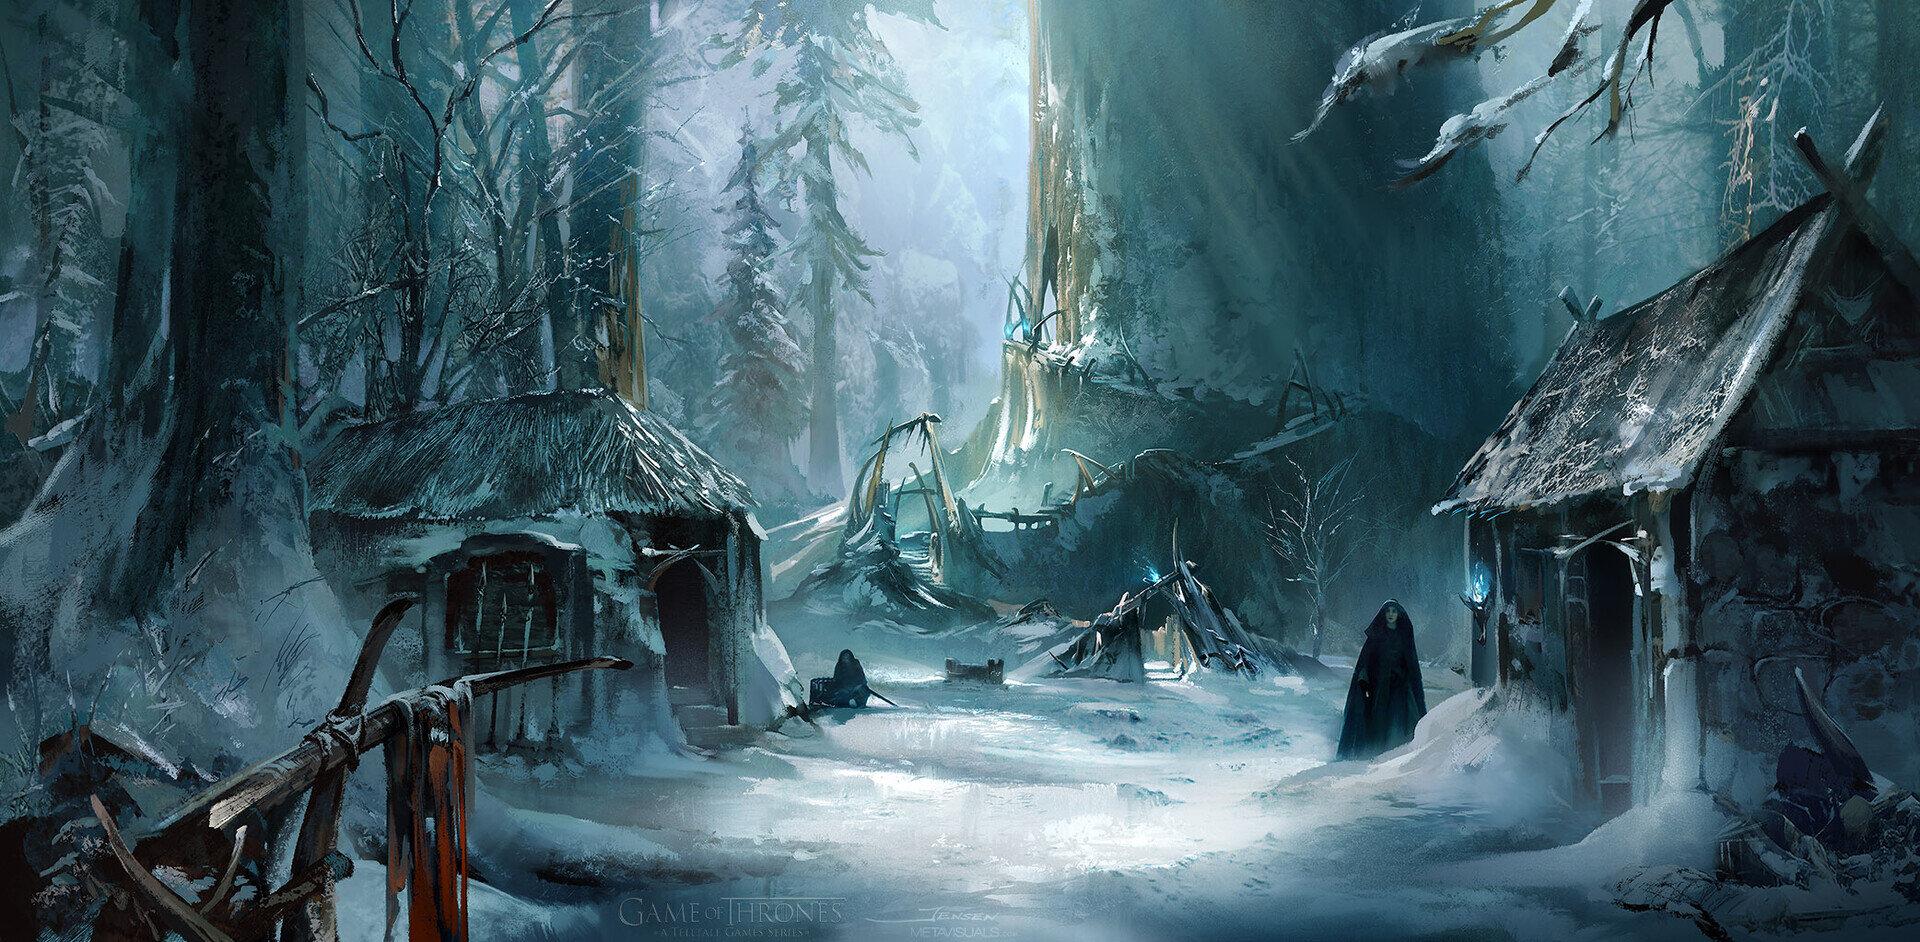 patrick-jensen-patrickjensen-metavisualsdotcom-gameofthrones-northgrovesketcha.jpg